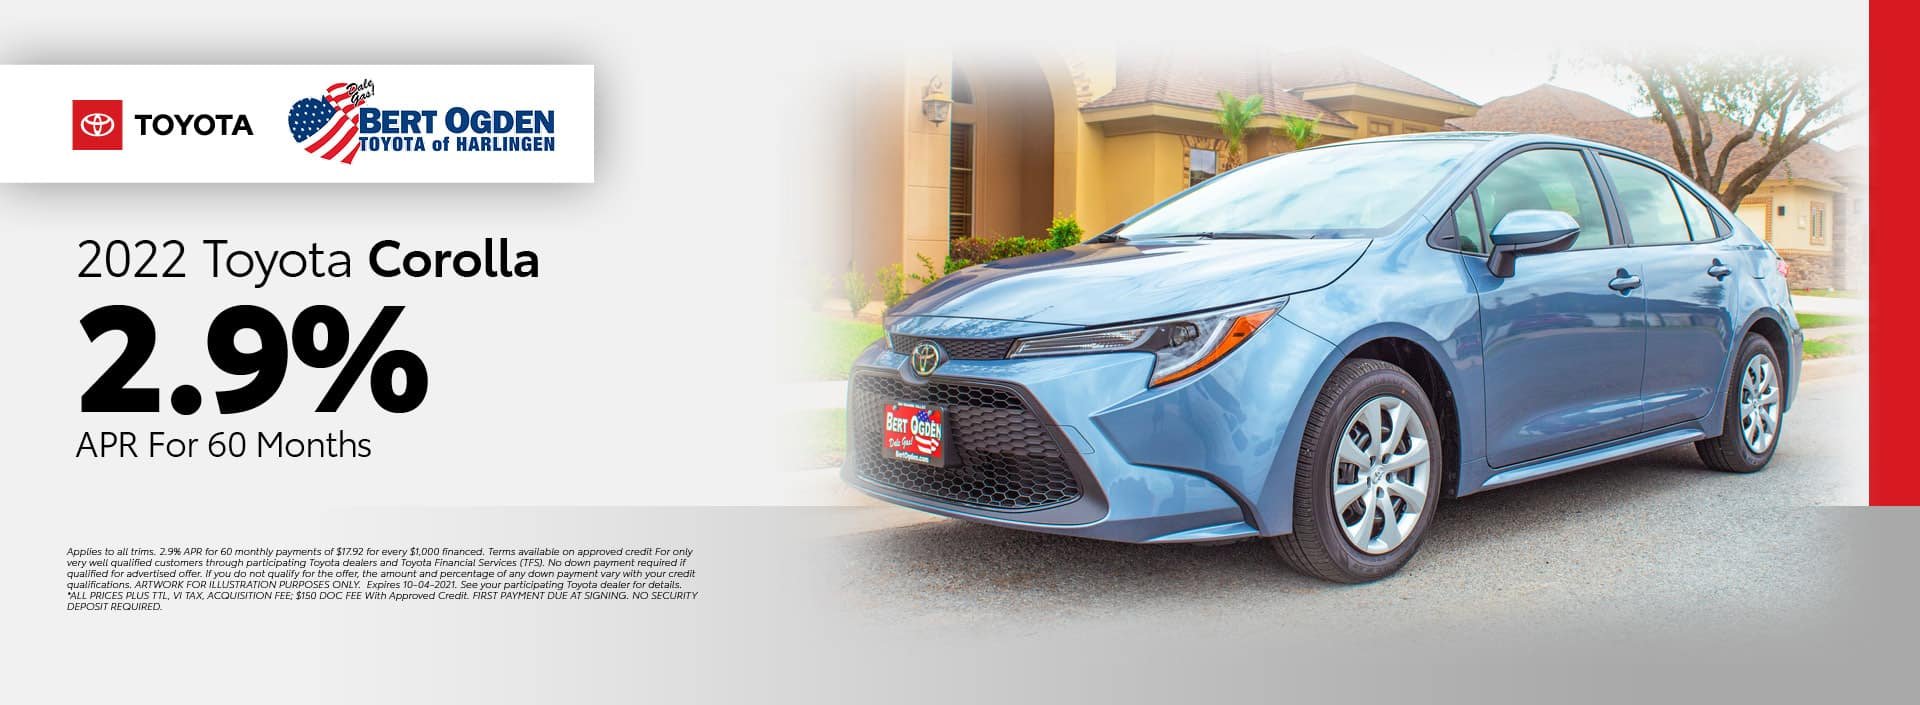 2022 Toyota Corolla APR Offer | Bert Ogden Toyota in Harlingen, Texas